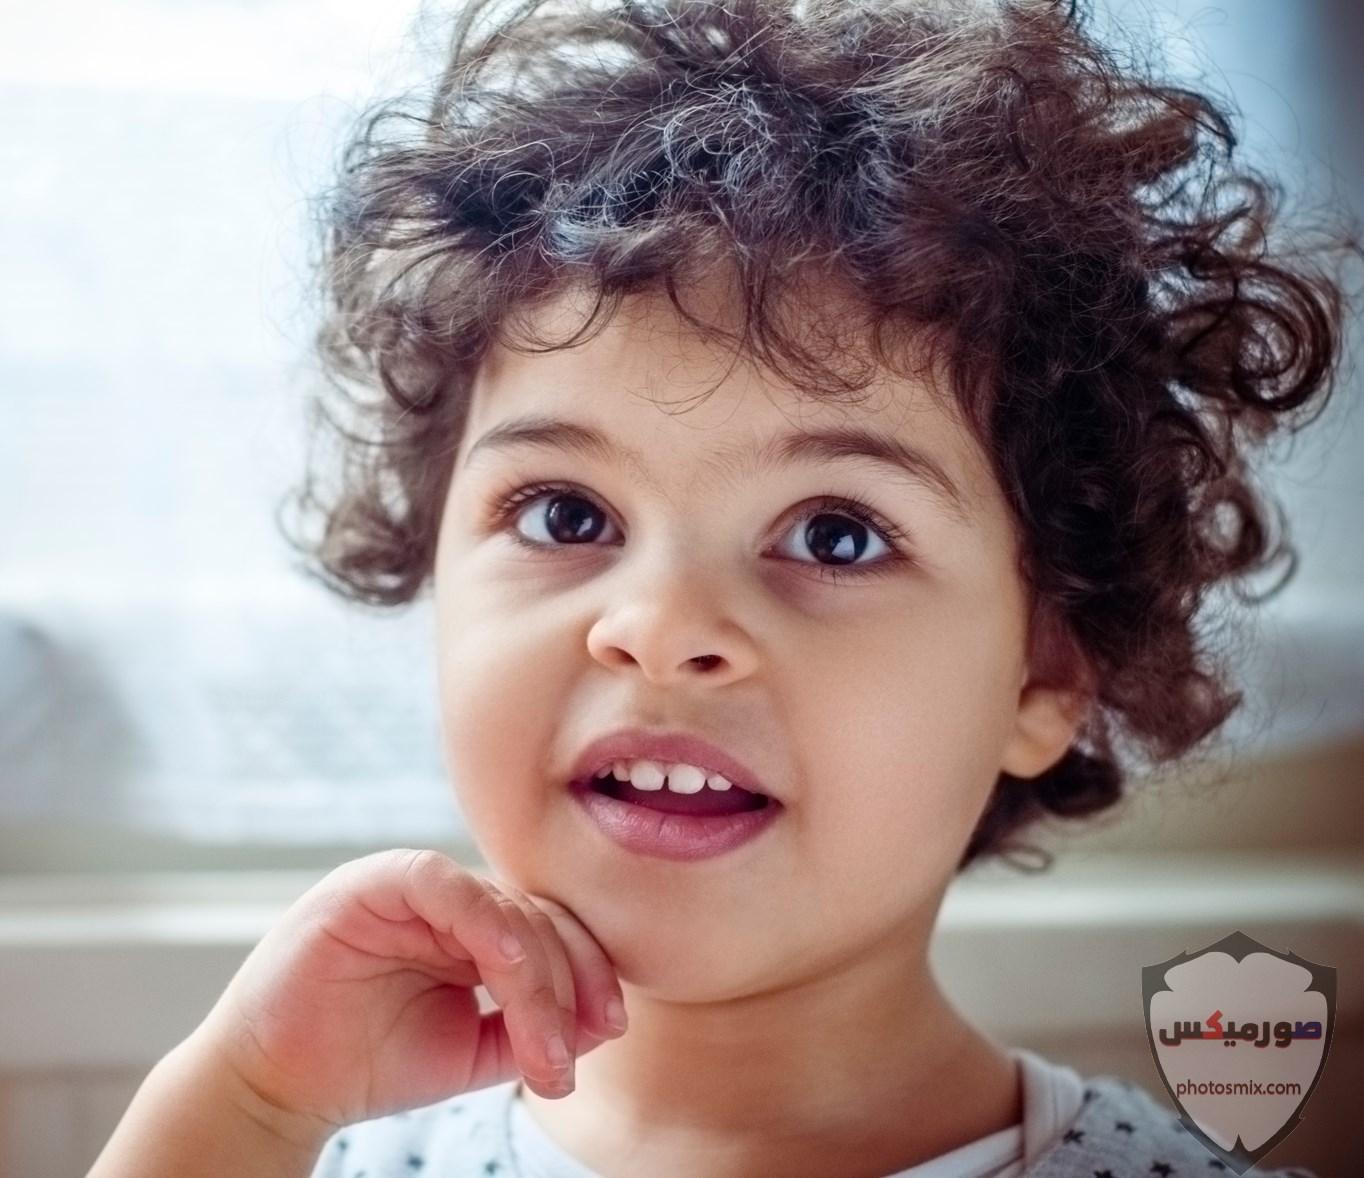 صور اطفال صور بيبي صور اولاد صور حلوين اطفال حلوينصور اطفال صغار2020 50